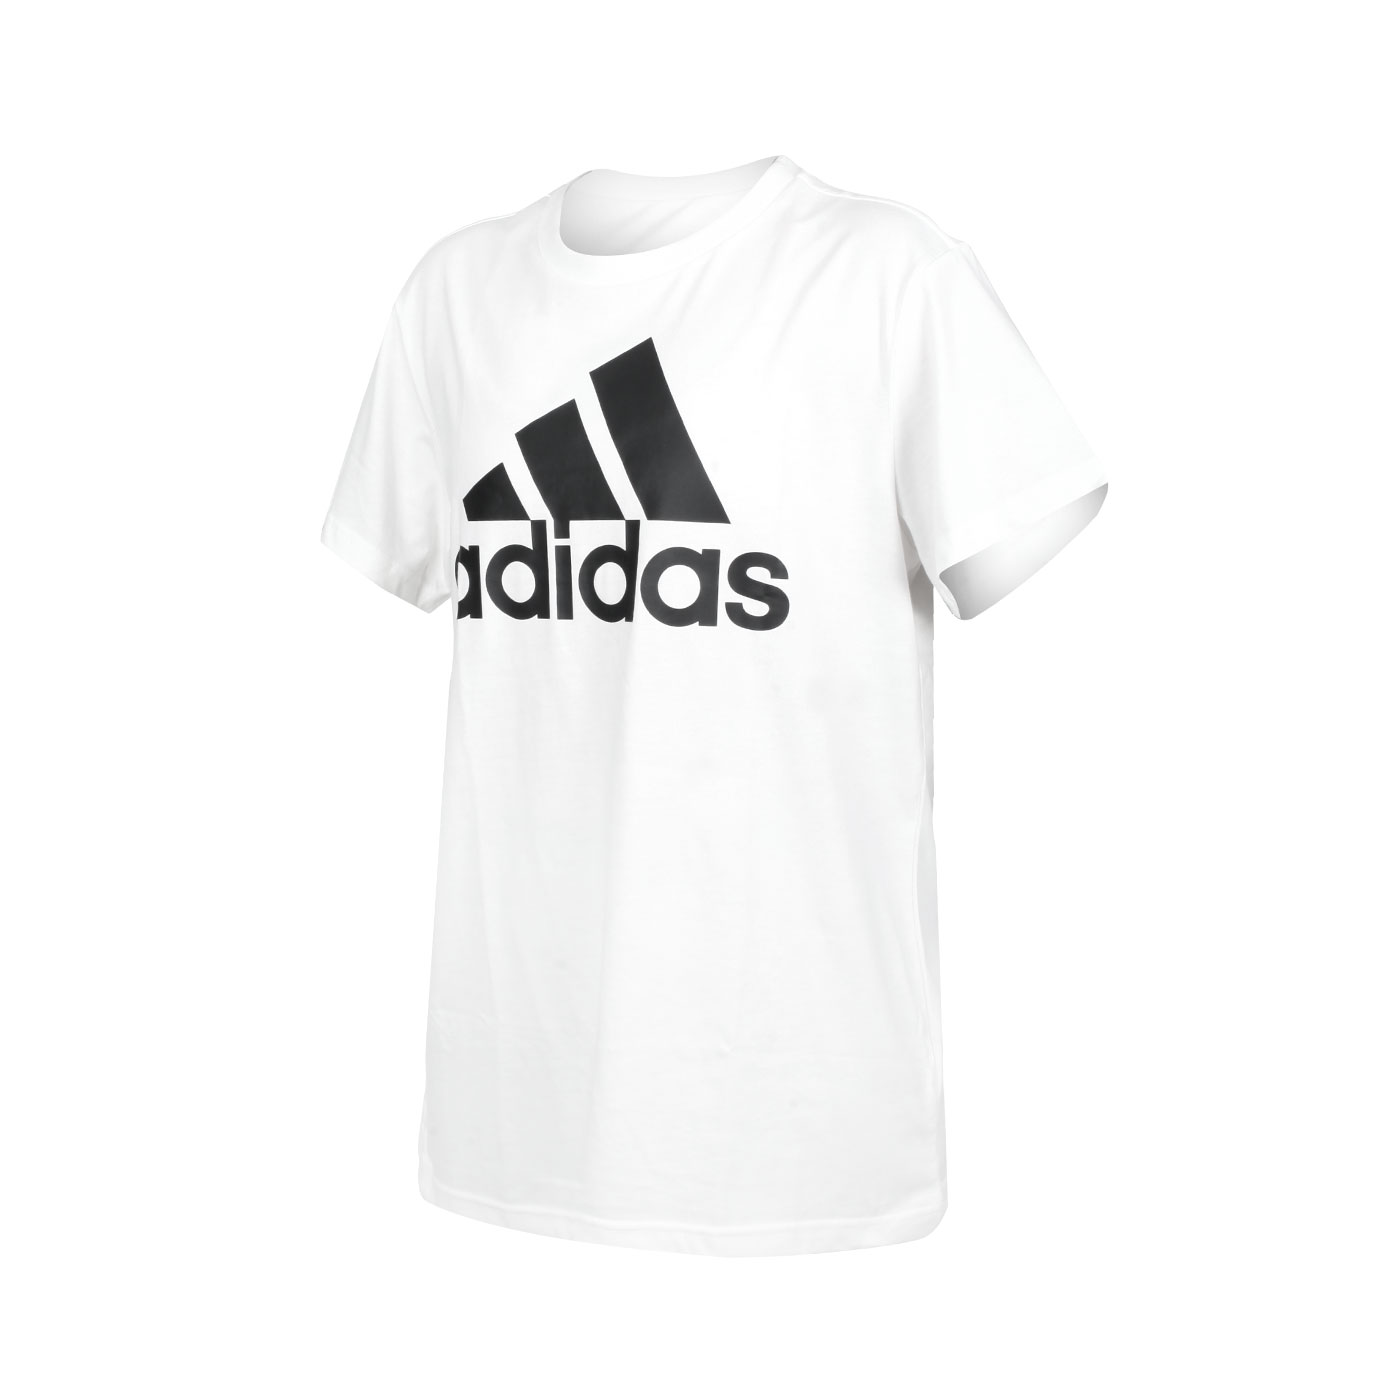 ADIDAS 女款短袖T恤 GL0779